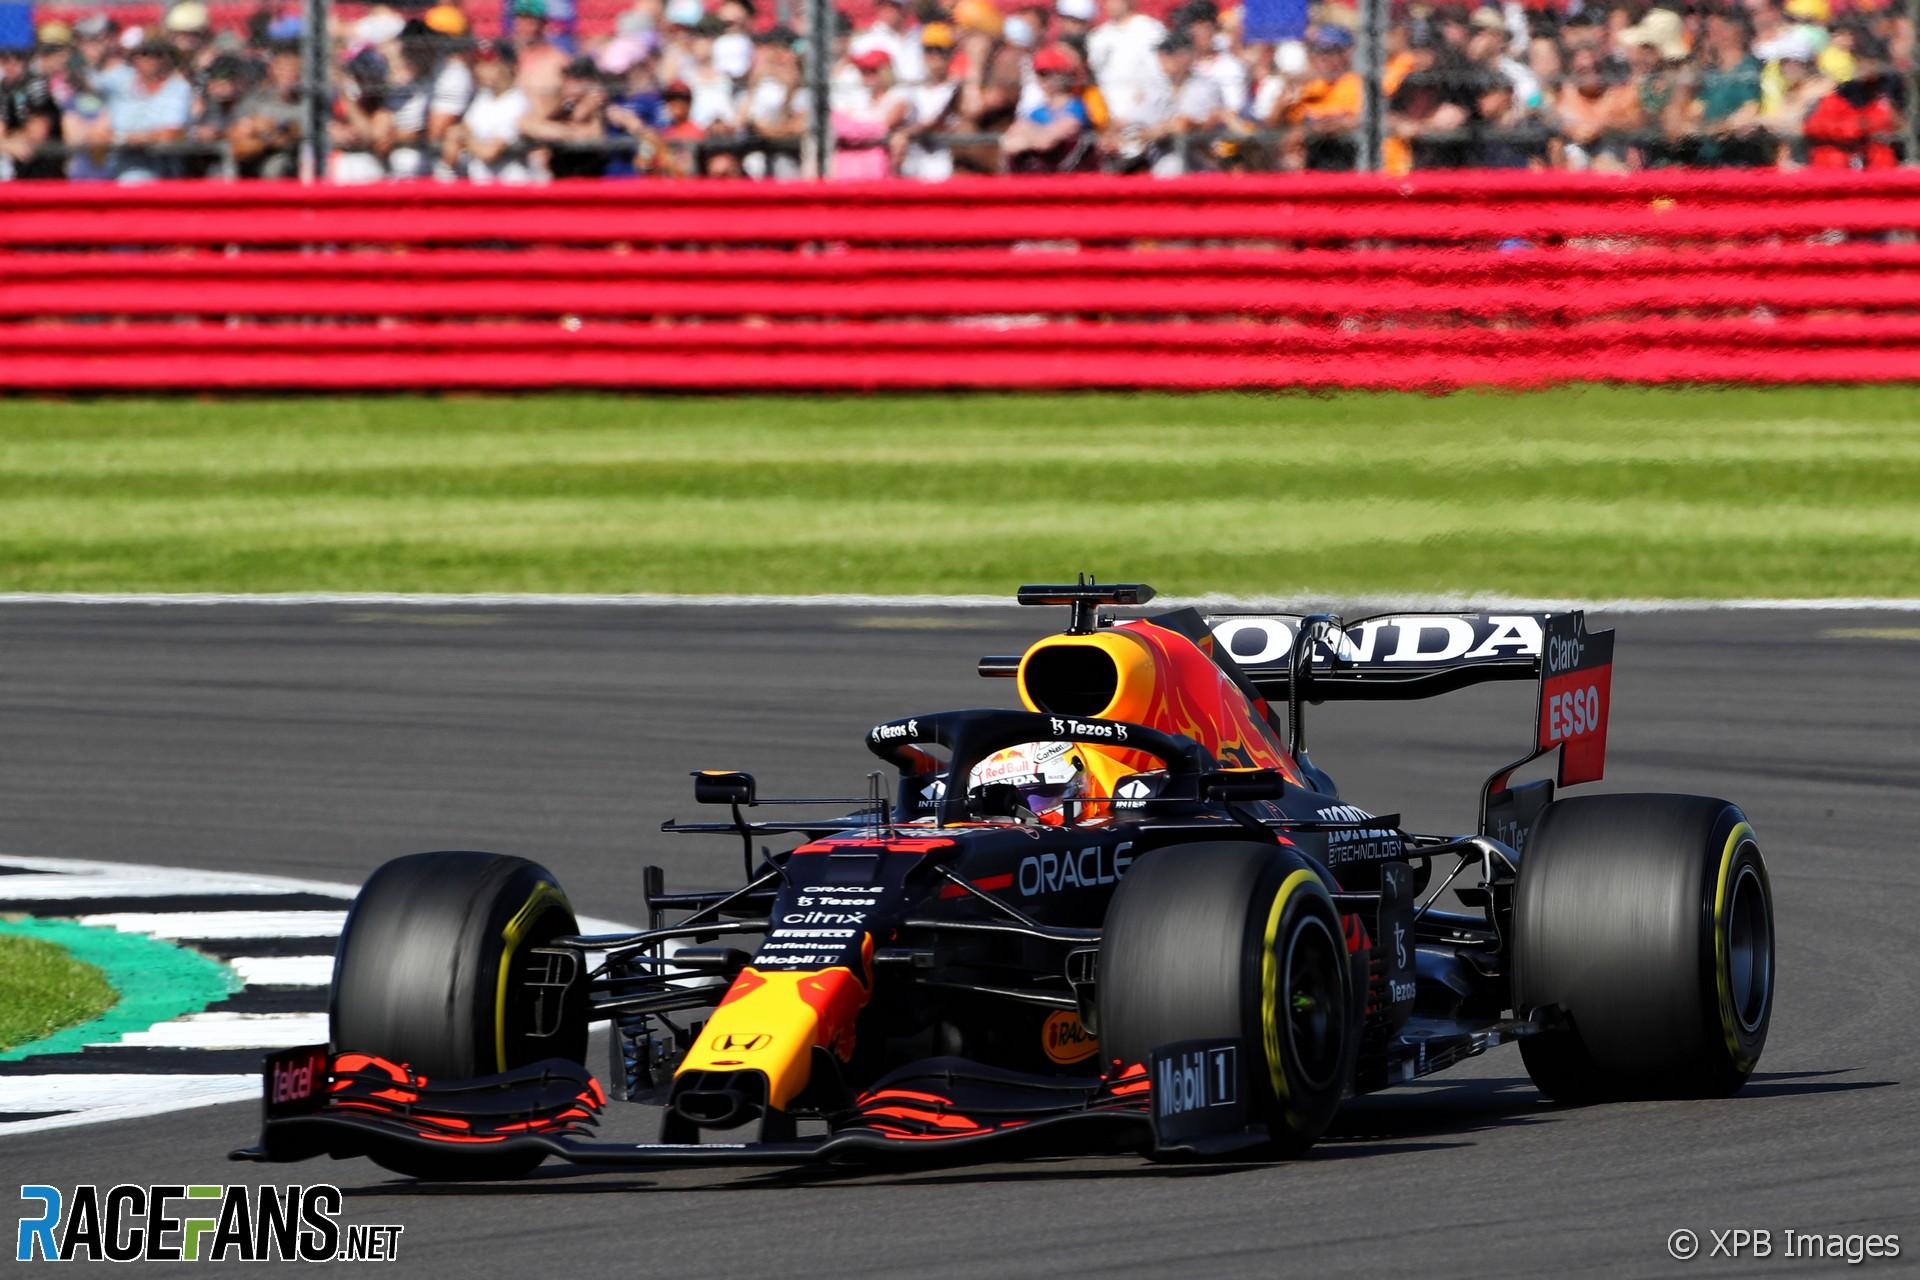 Max Verstappen, Red Bull, Silverstone, 2021